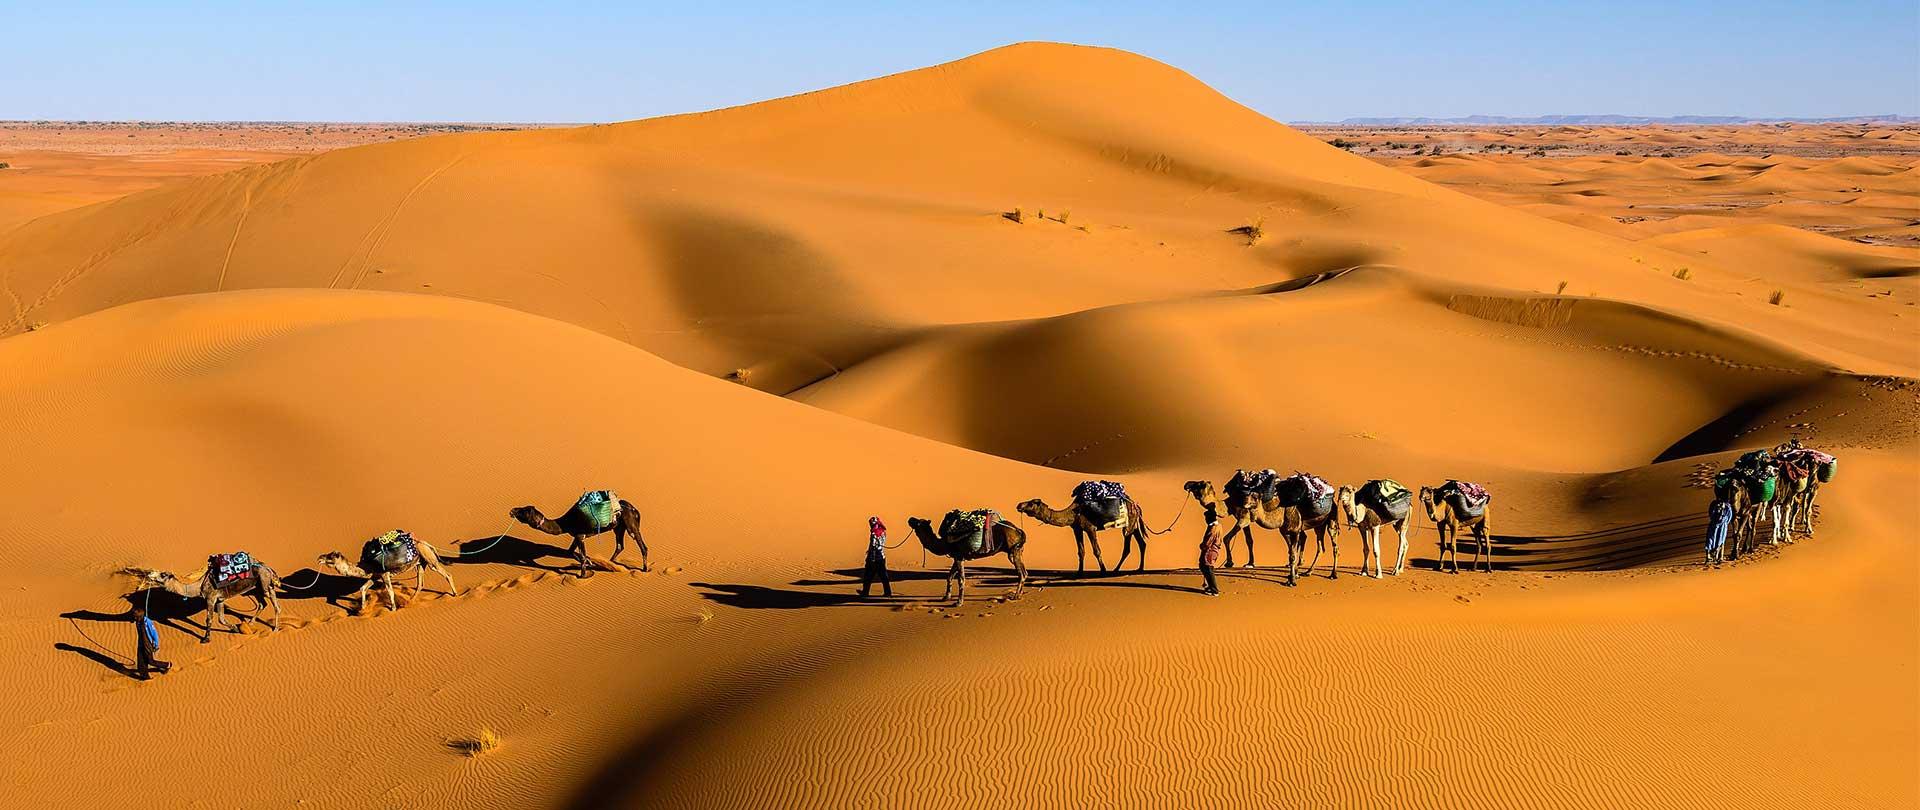 3 Day tour from Marrakech to Erg Chigaga